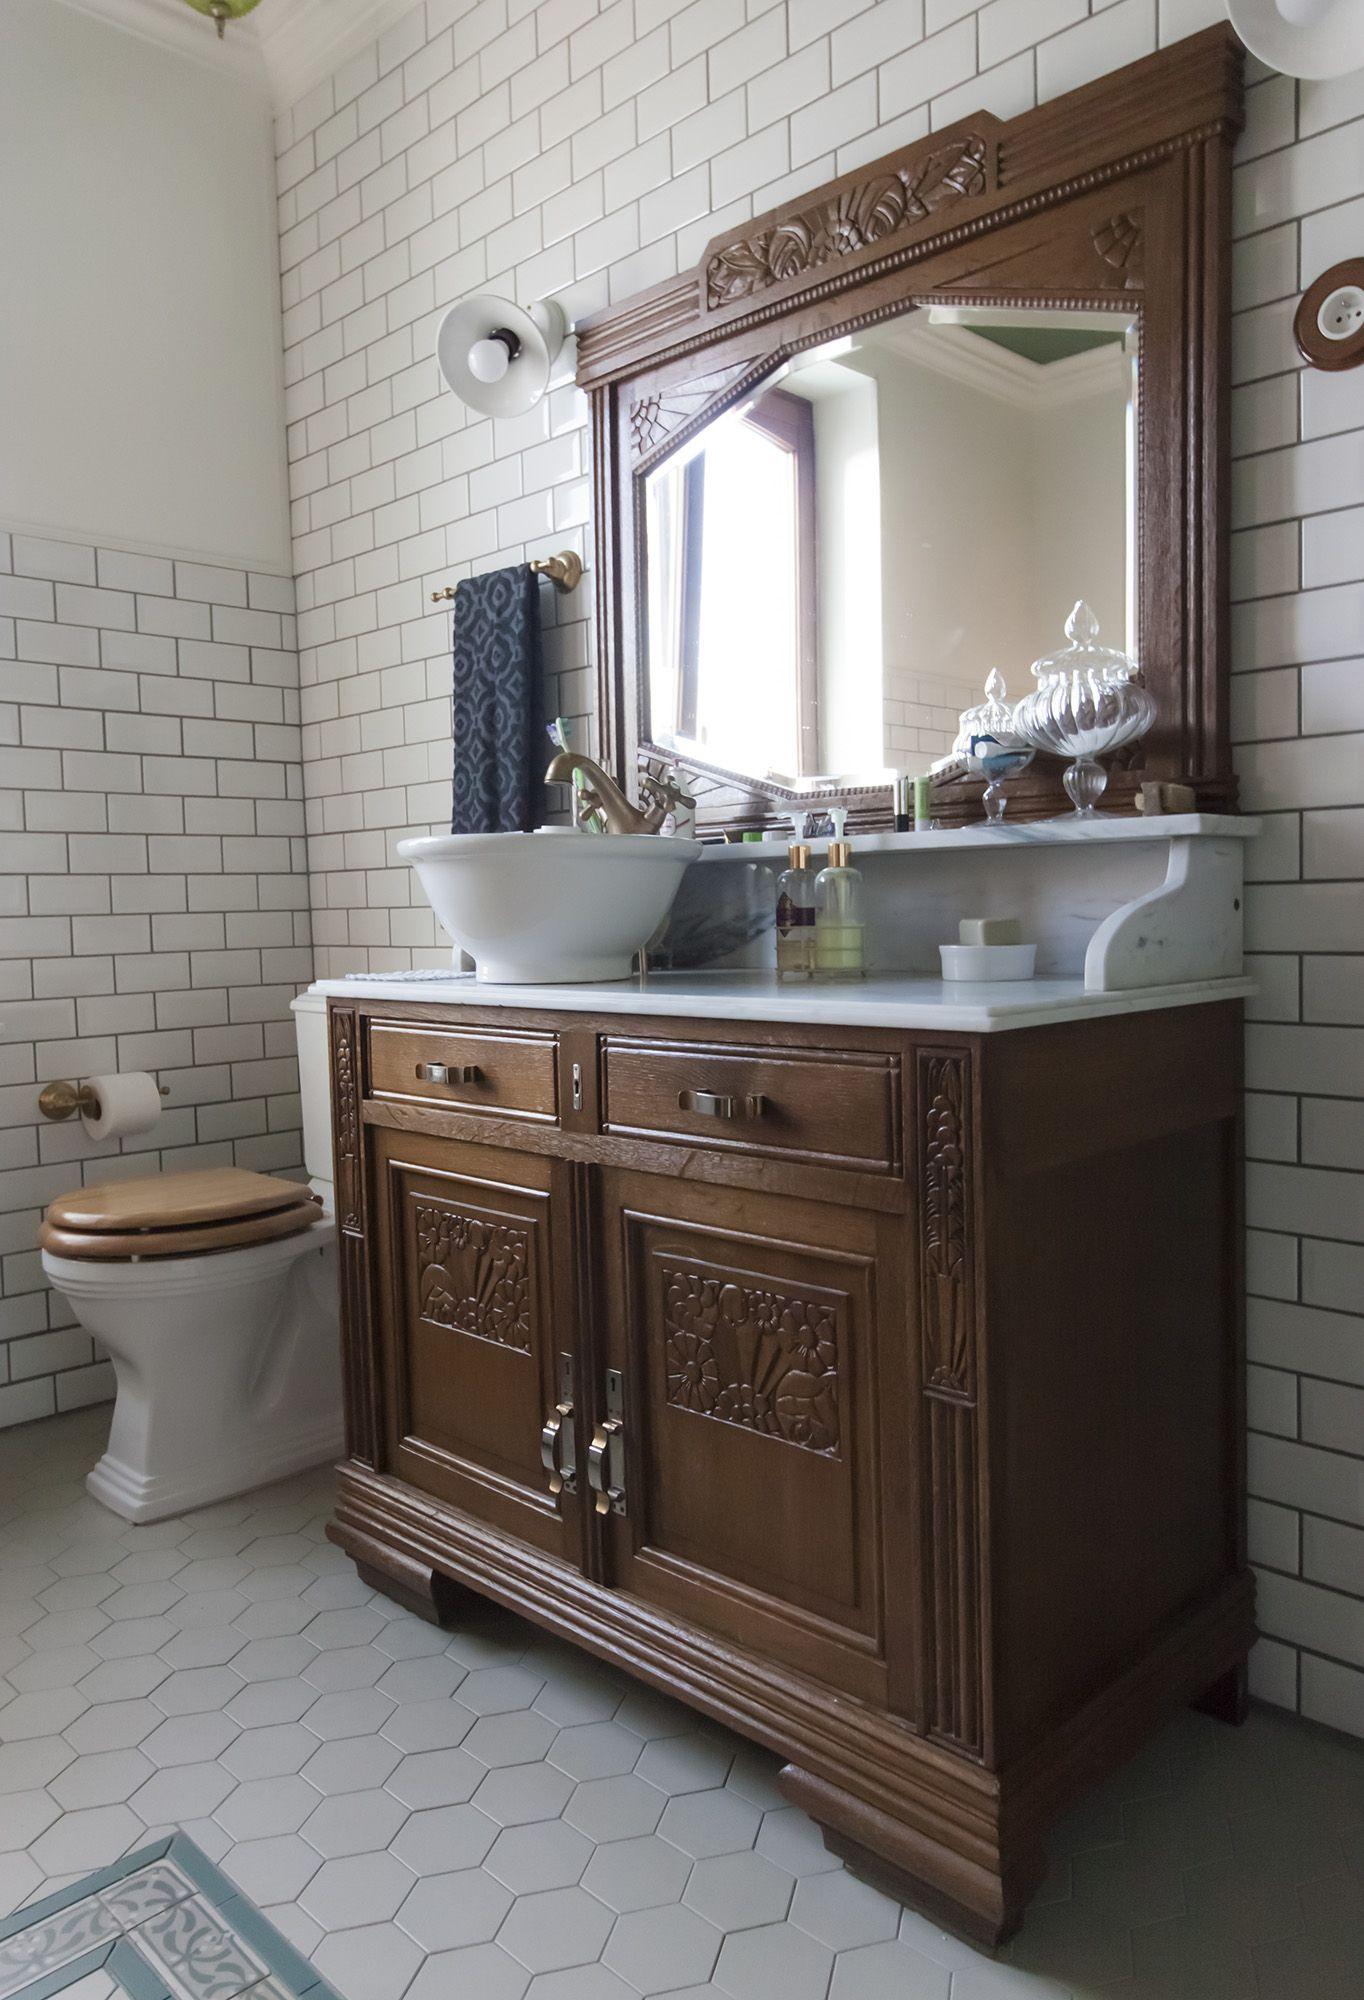 Antique washstandwashbasin vintage inspired 30s art